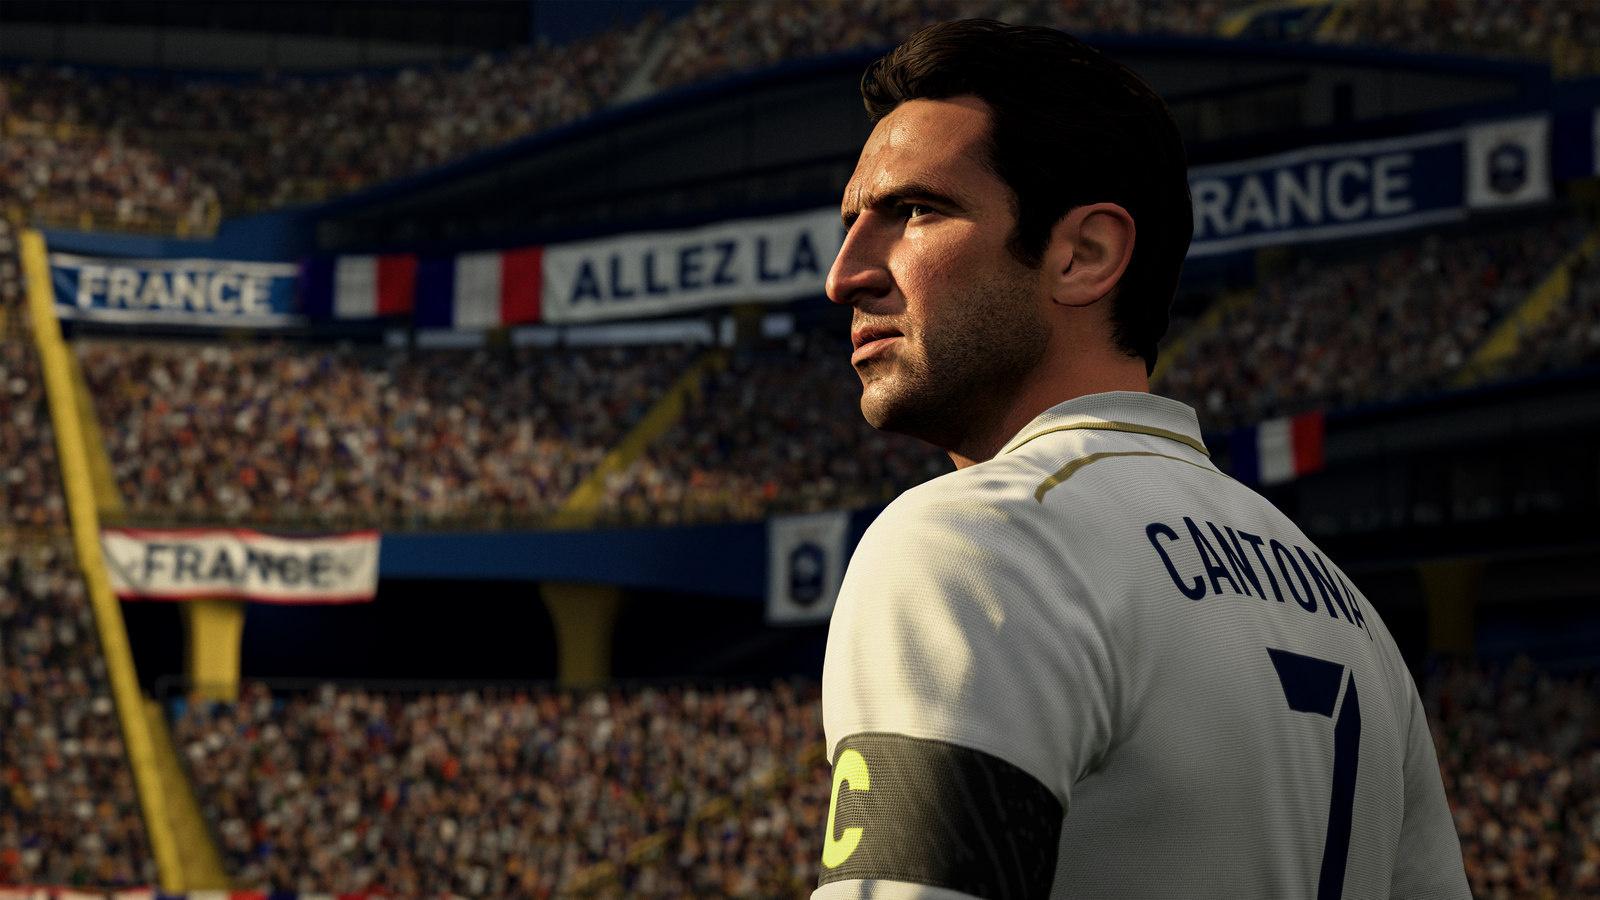 FIFA21 и NHL21 скоро появятся в библиотеке EA Play